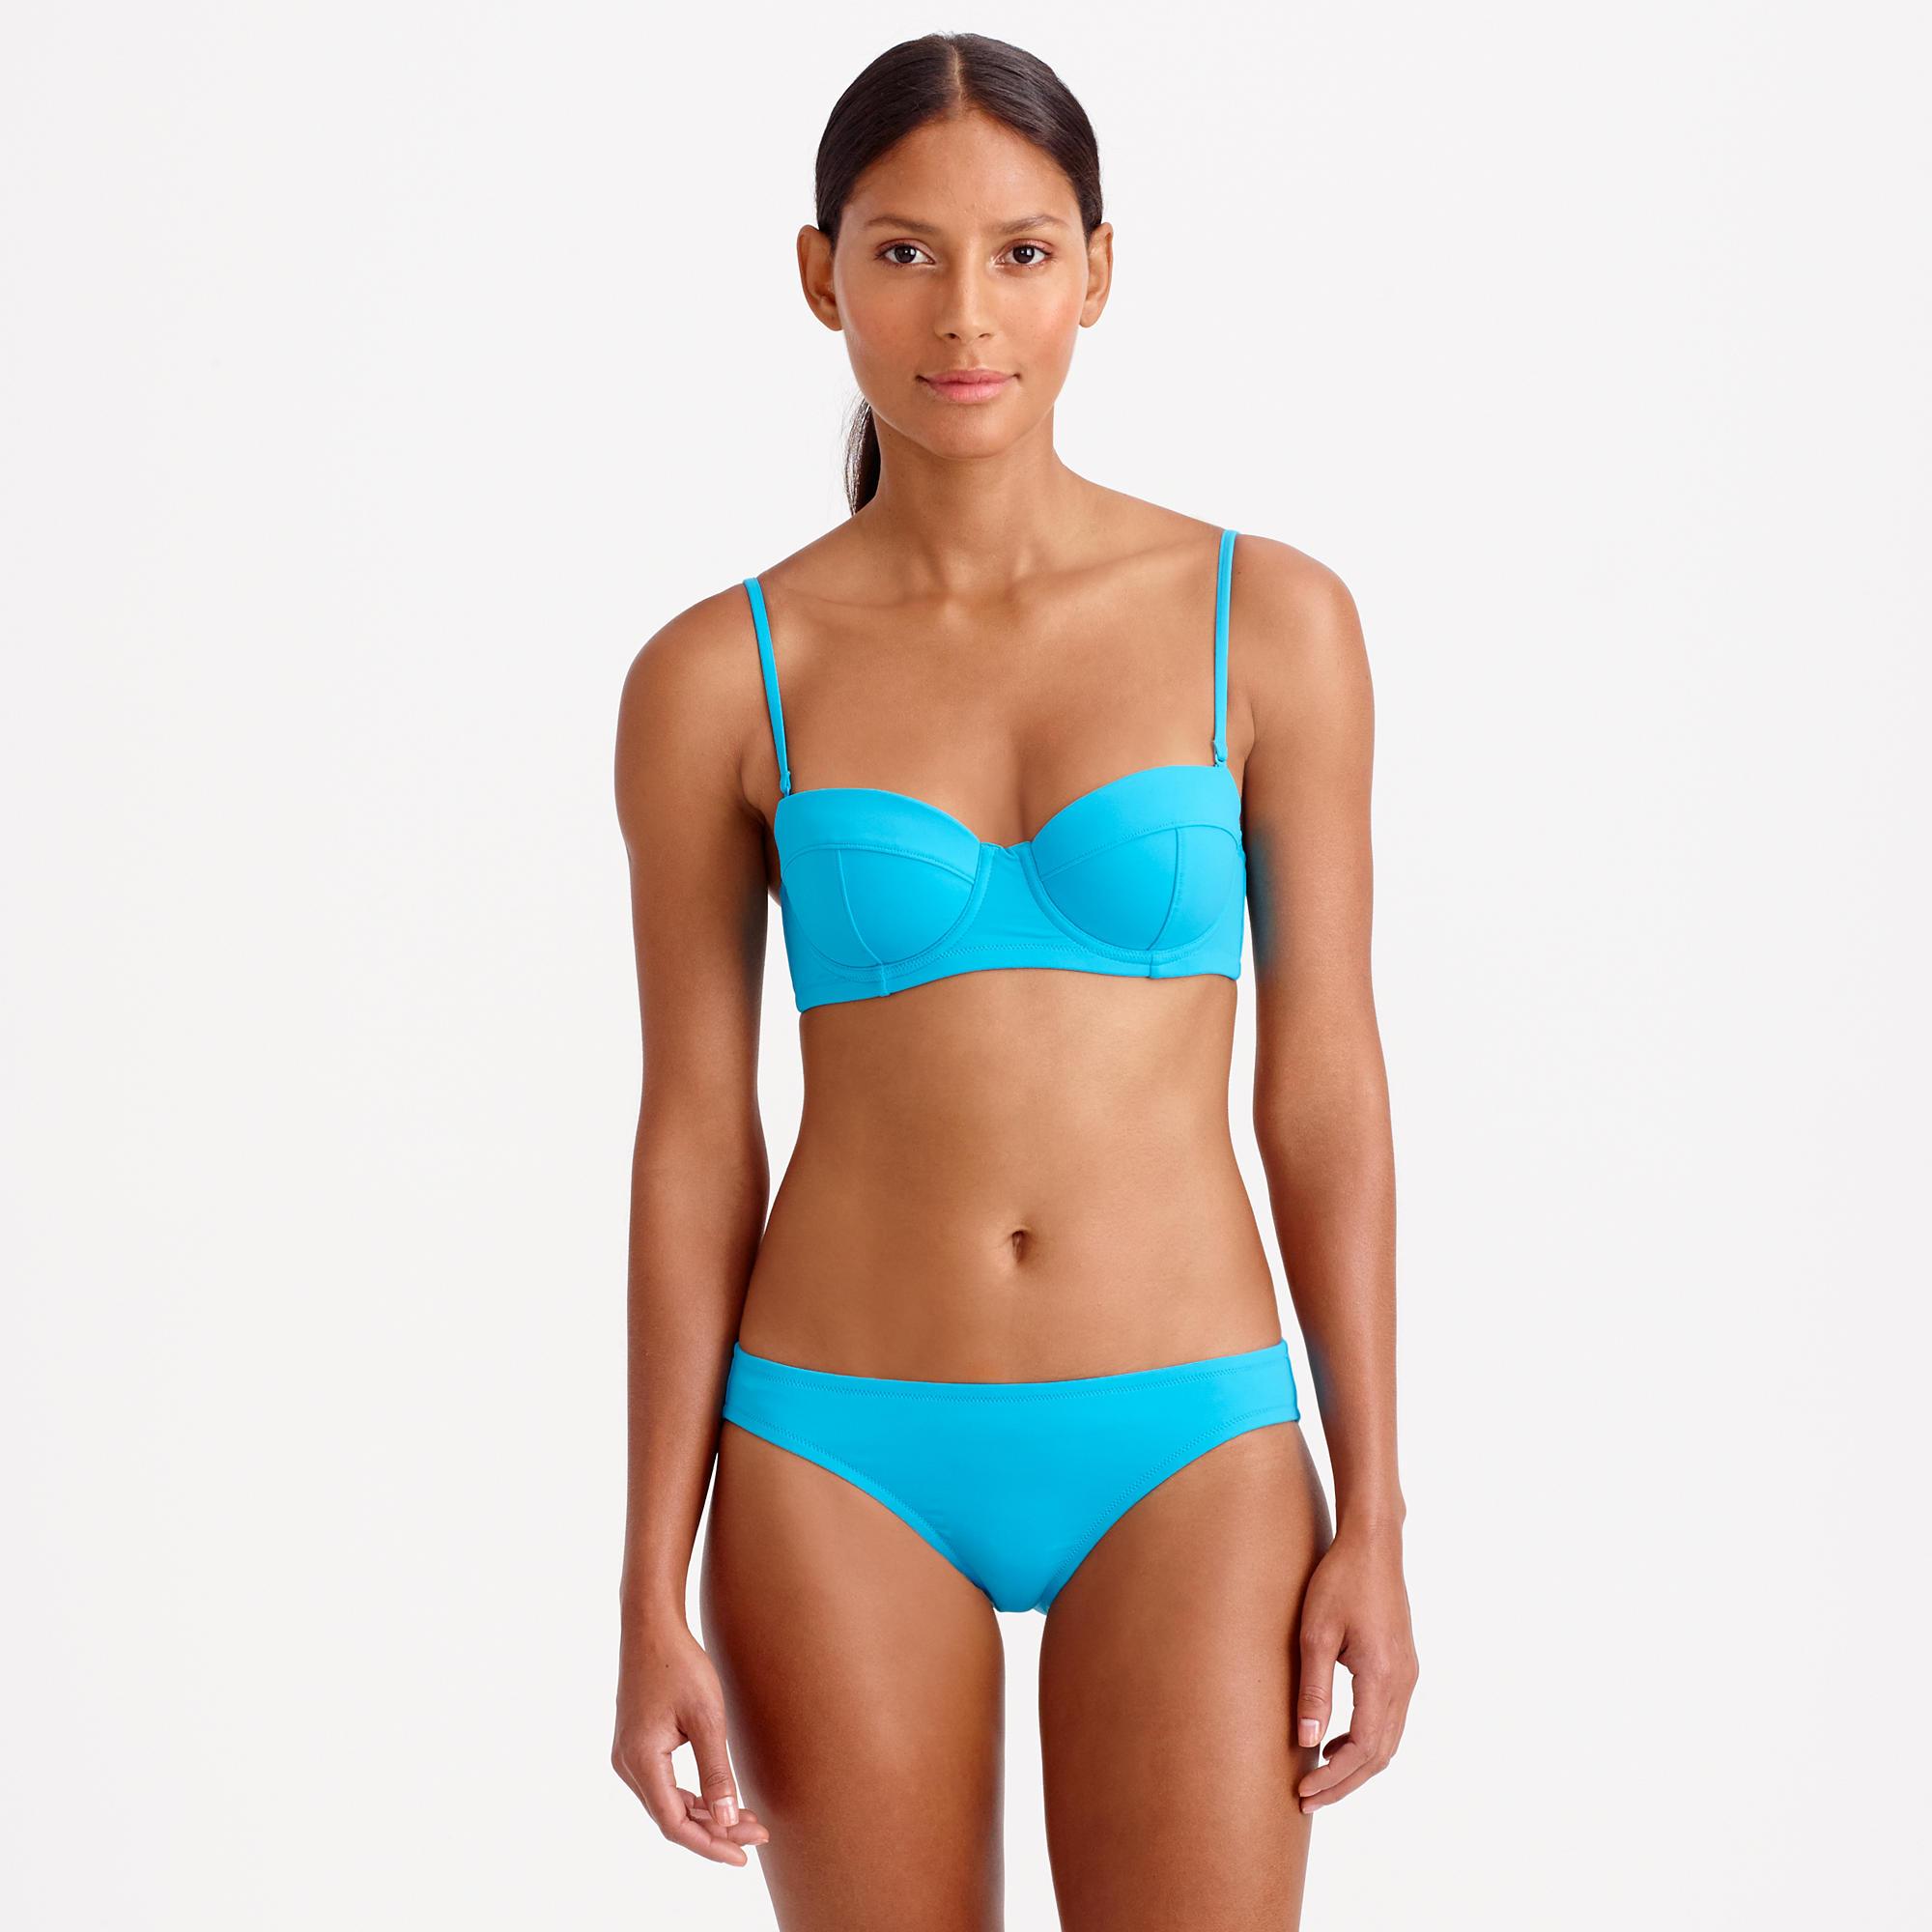 1426a17b59273 Lyst - J.Crew Dd-cup Italian Matte Underwire Bikini Top in Blue